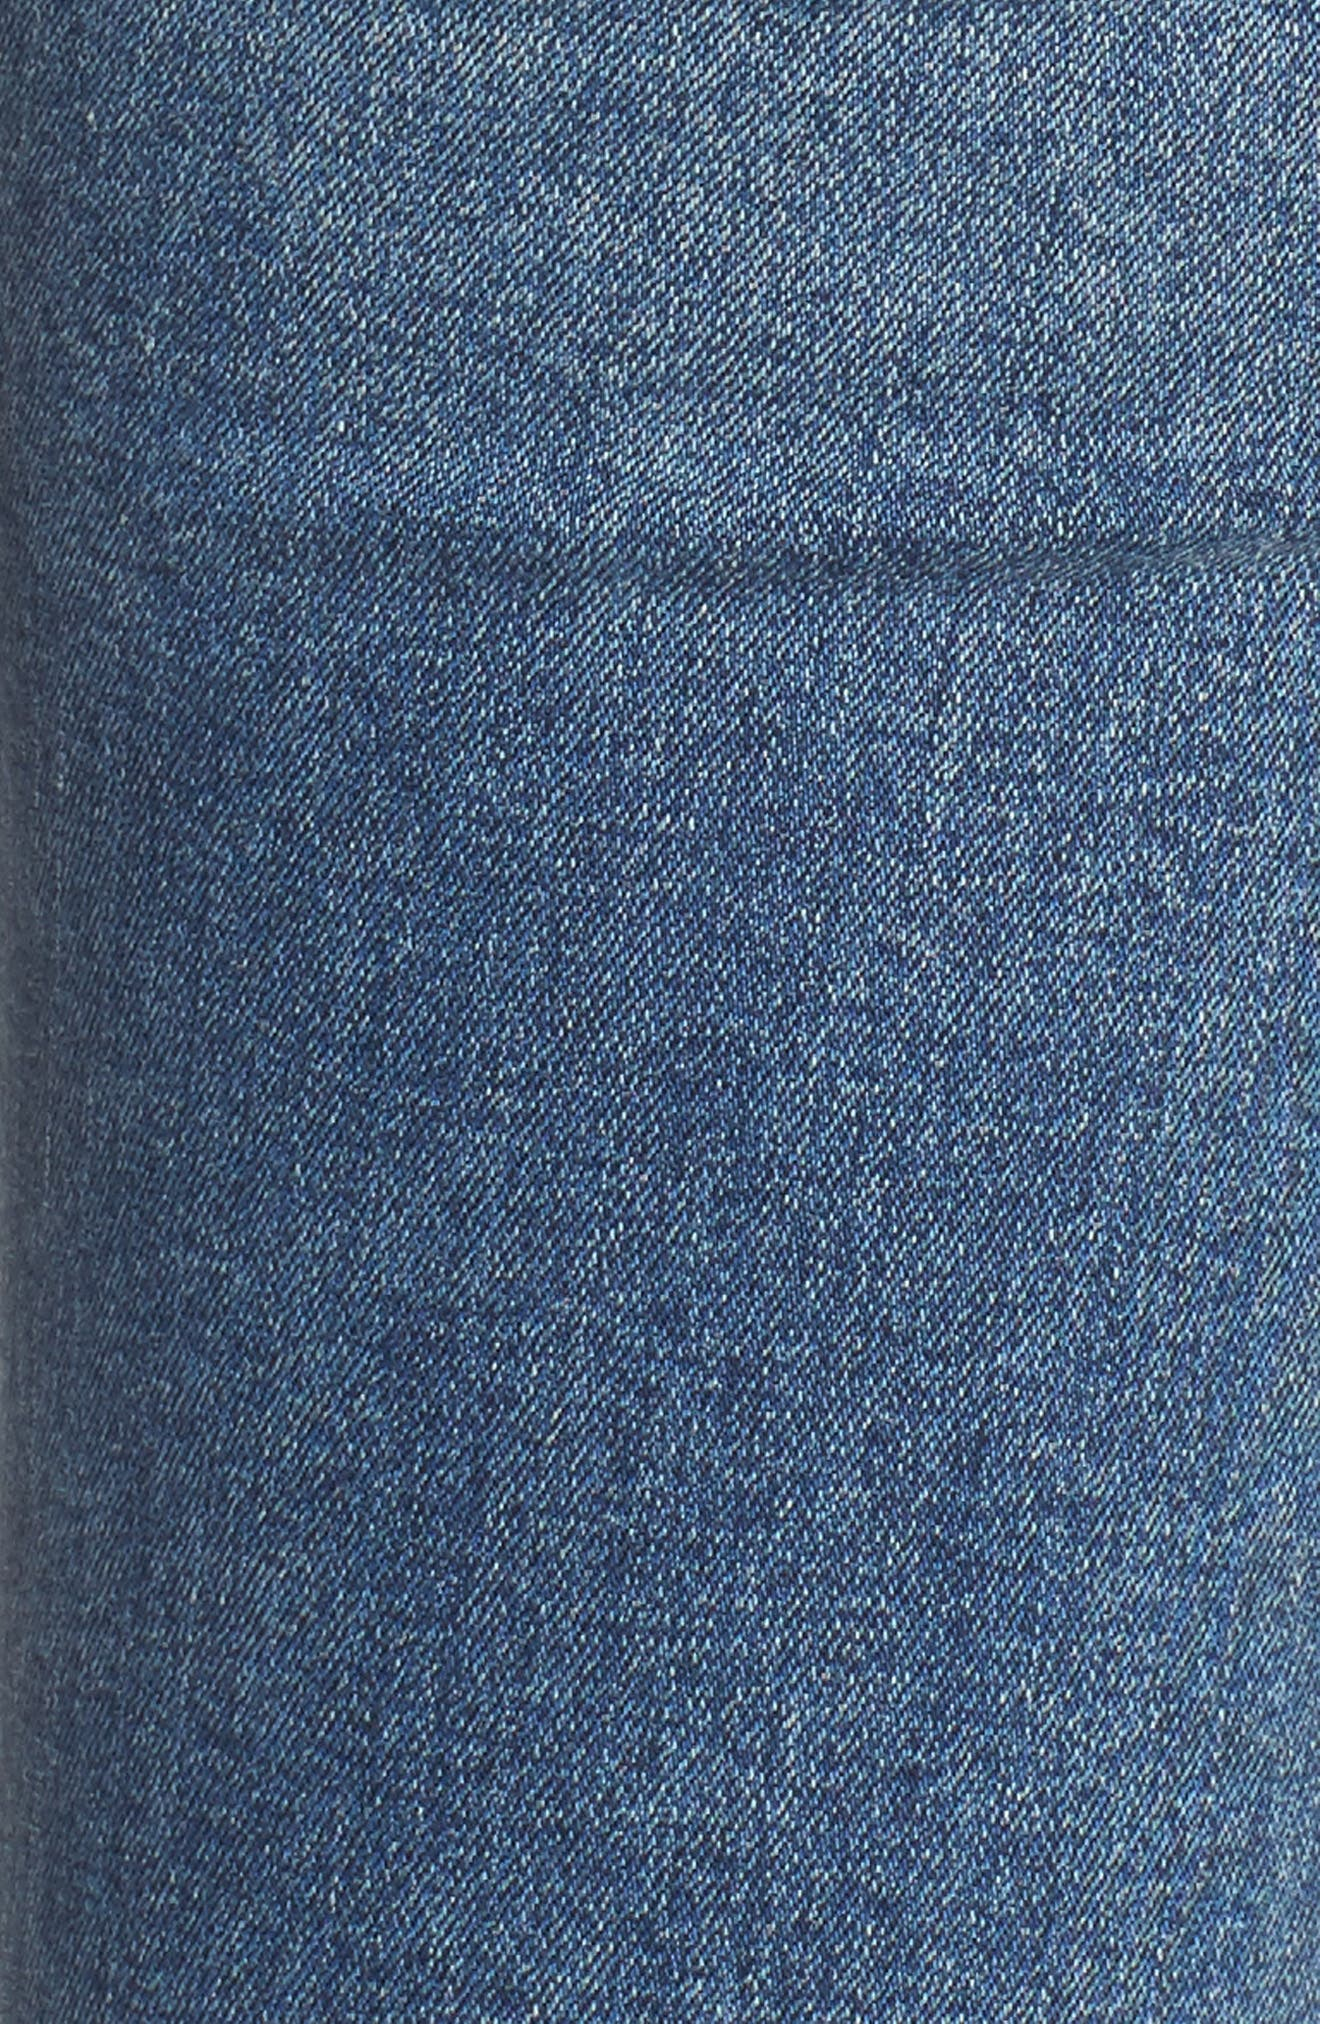 Alternate Image 5  - Citizens of Humanity Rocket Crop Skinny Jeans (Orbit)